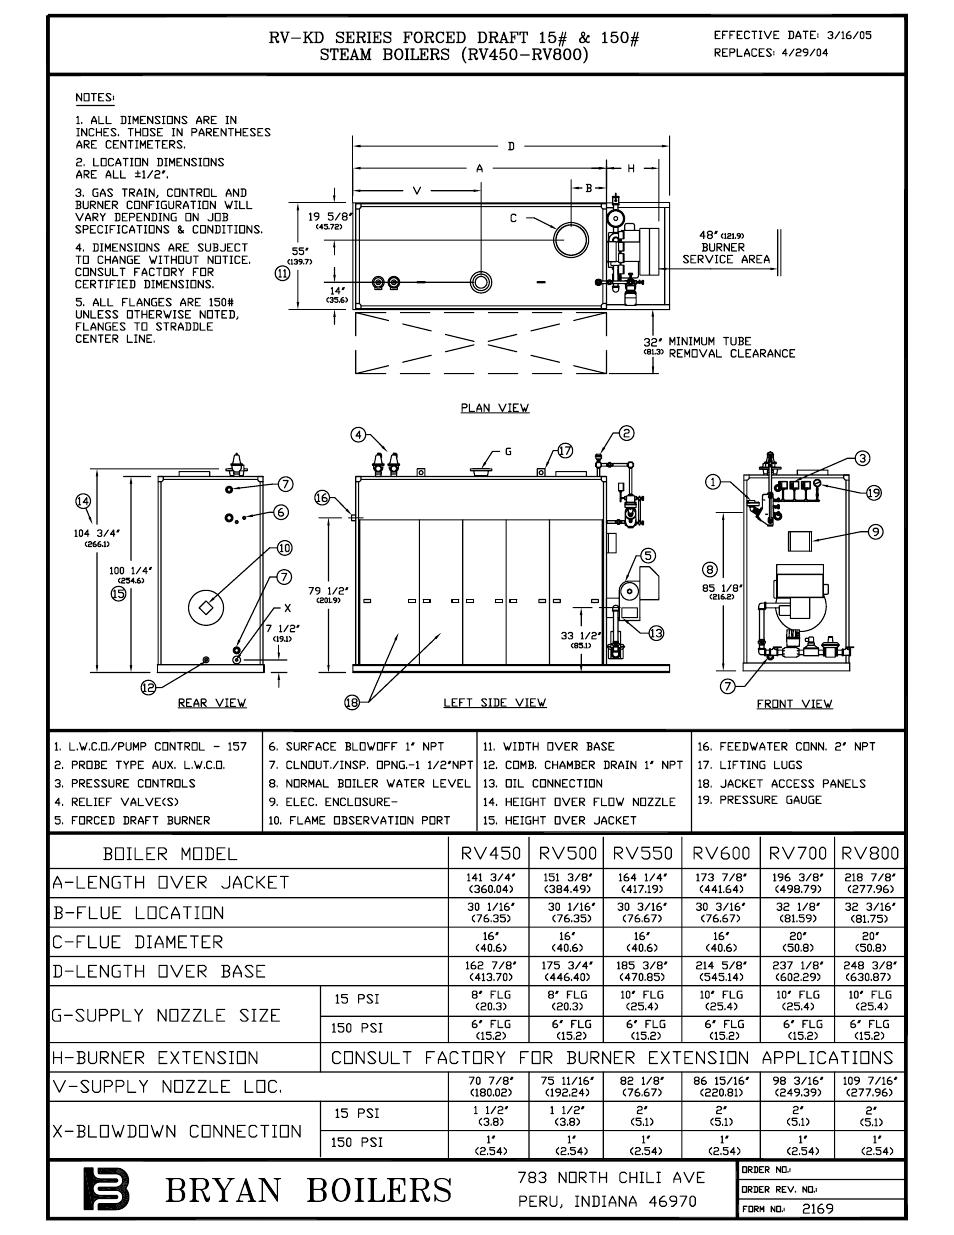 bryan boilers rv450 page1 bryan boiler wiring diagram boiler parts catalog, boiler flow bryan boiler wiring diagram at webbmarketing.co